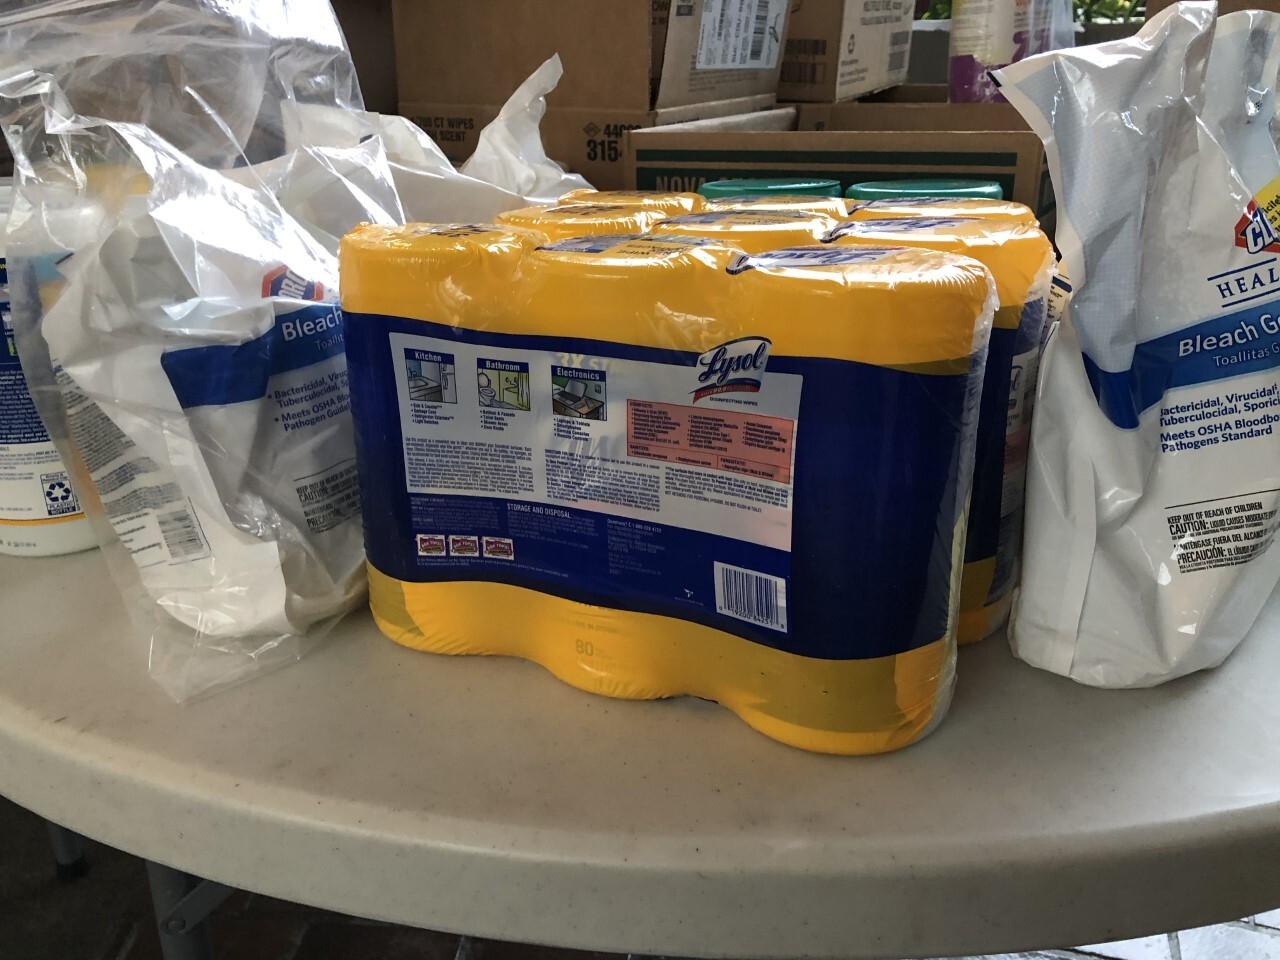 Cleveland Metropolitian School District donates medical supplies.